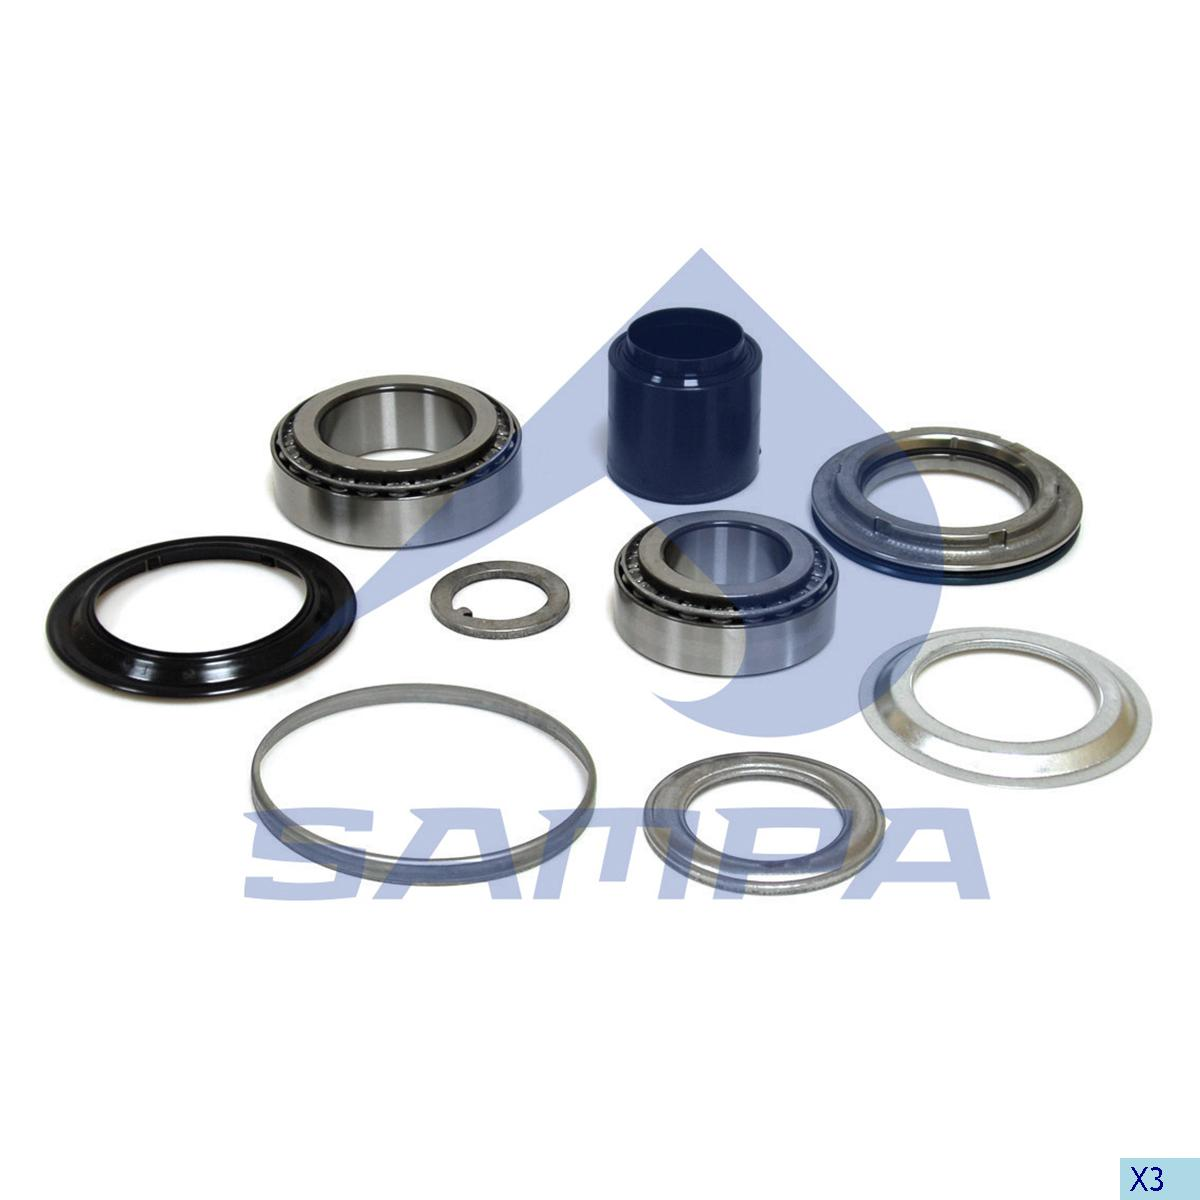 Repair Kit, Wheel Hub, Bergische Achsen, Power Unit